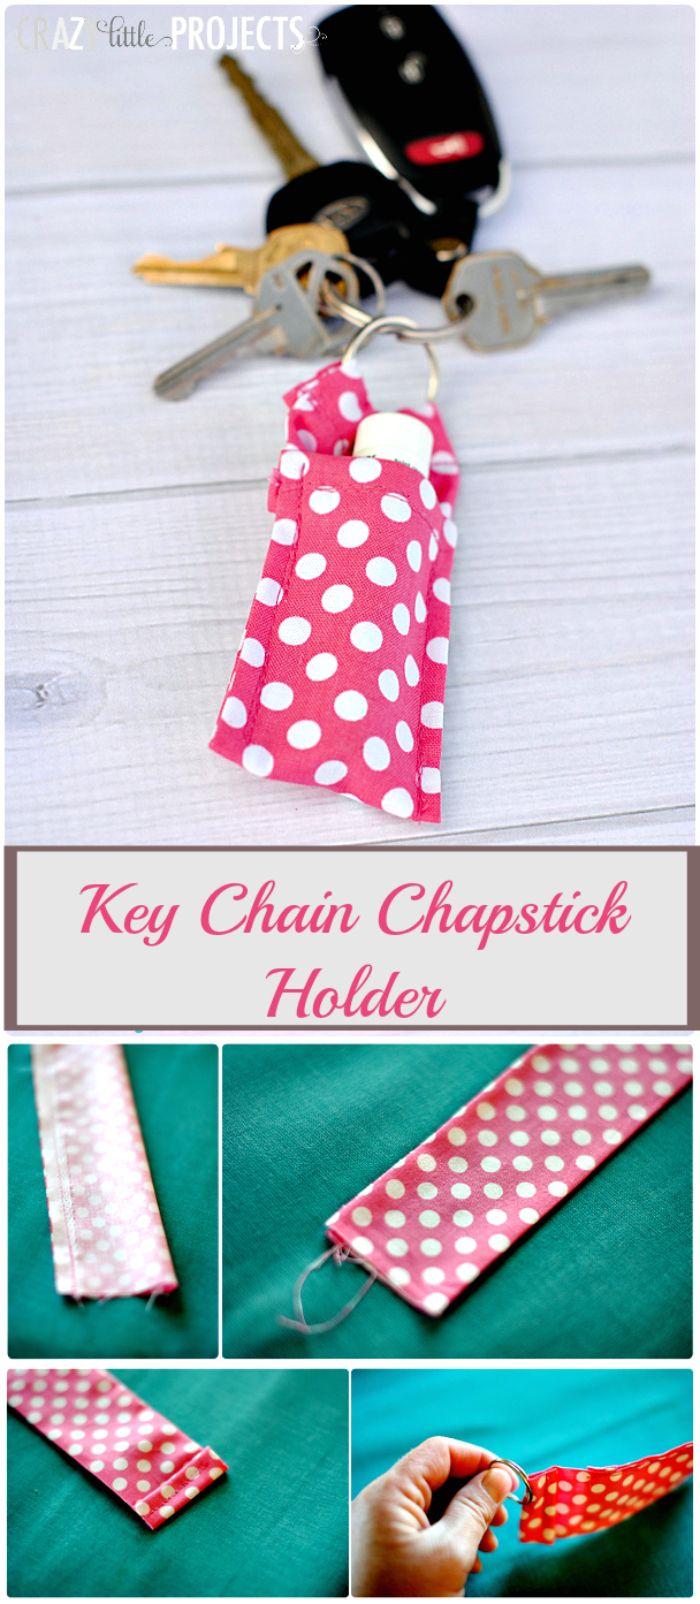 Key-Chain-Chapstick-Holder